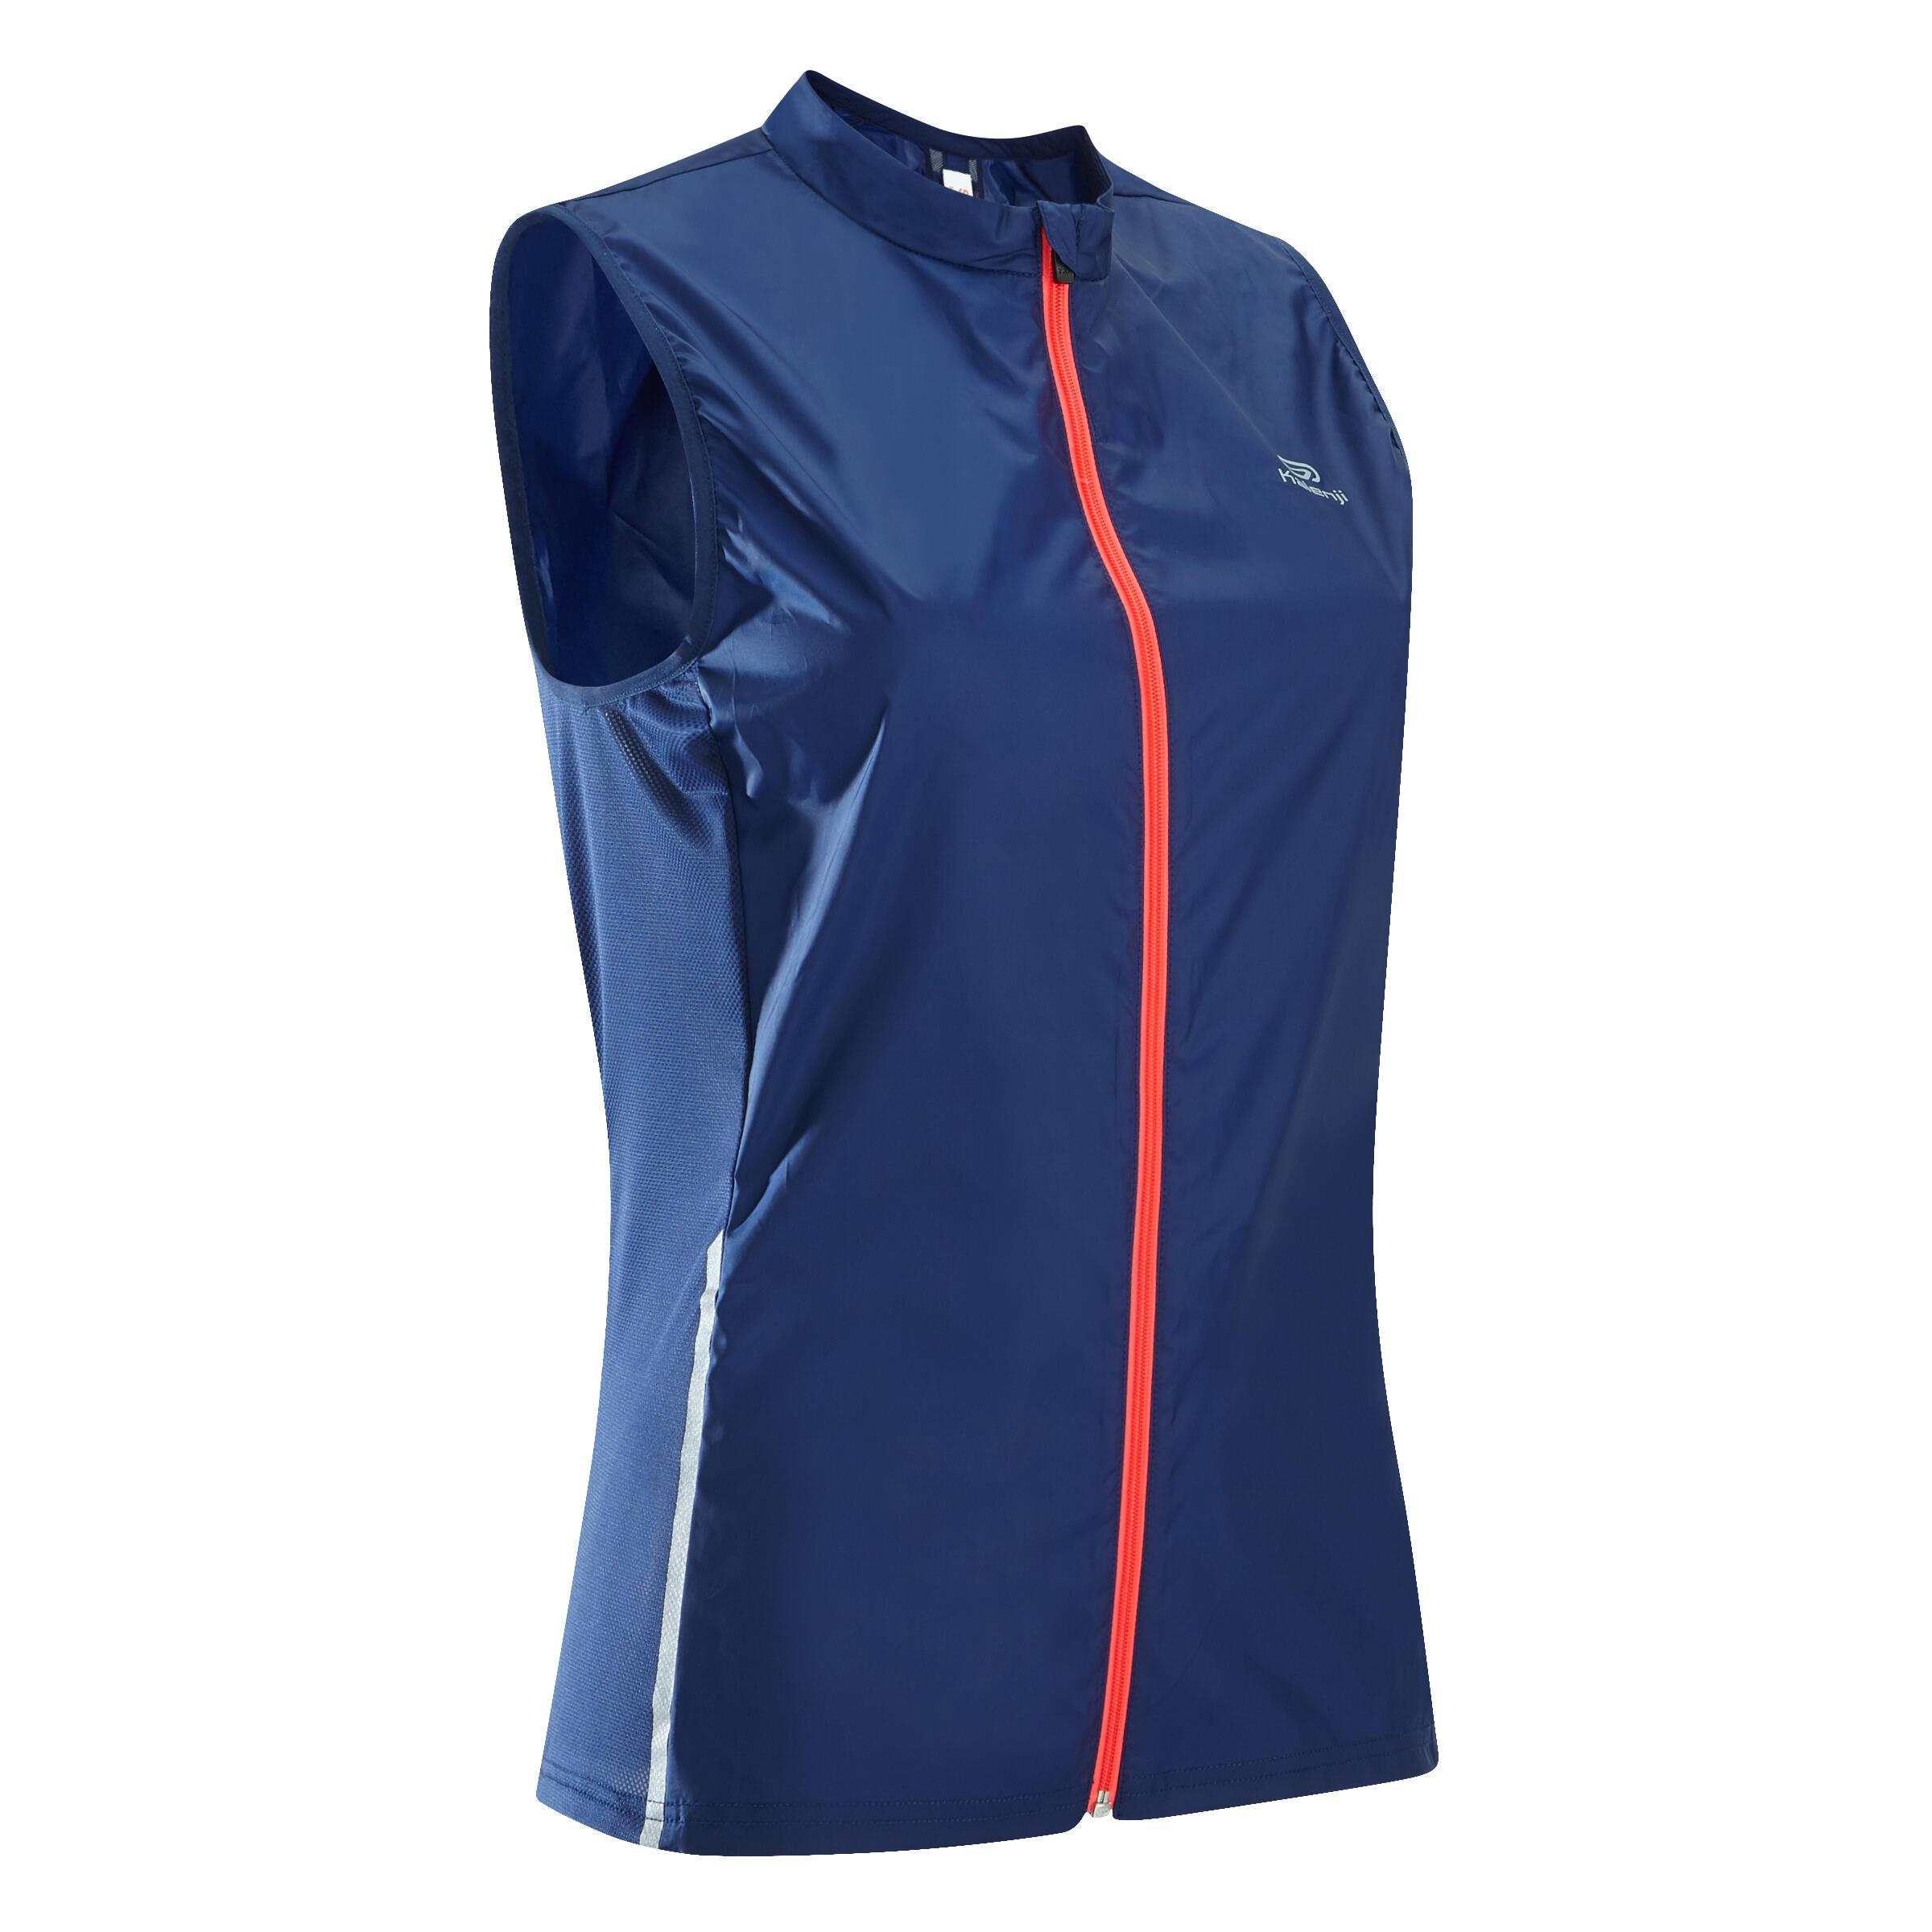 Laufweste Run Wind Damen koralle | Sportbekleidung > Sportwesten > Laufwesten | Blau - Rot - Rosa | Kalenji